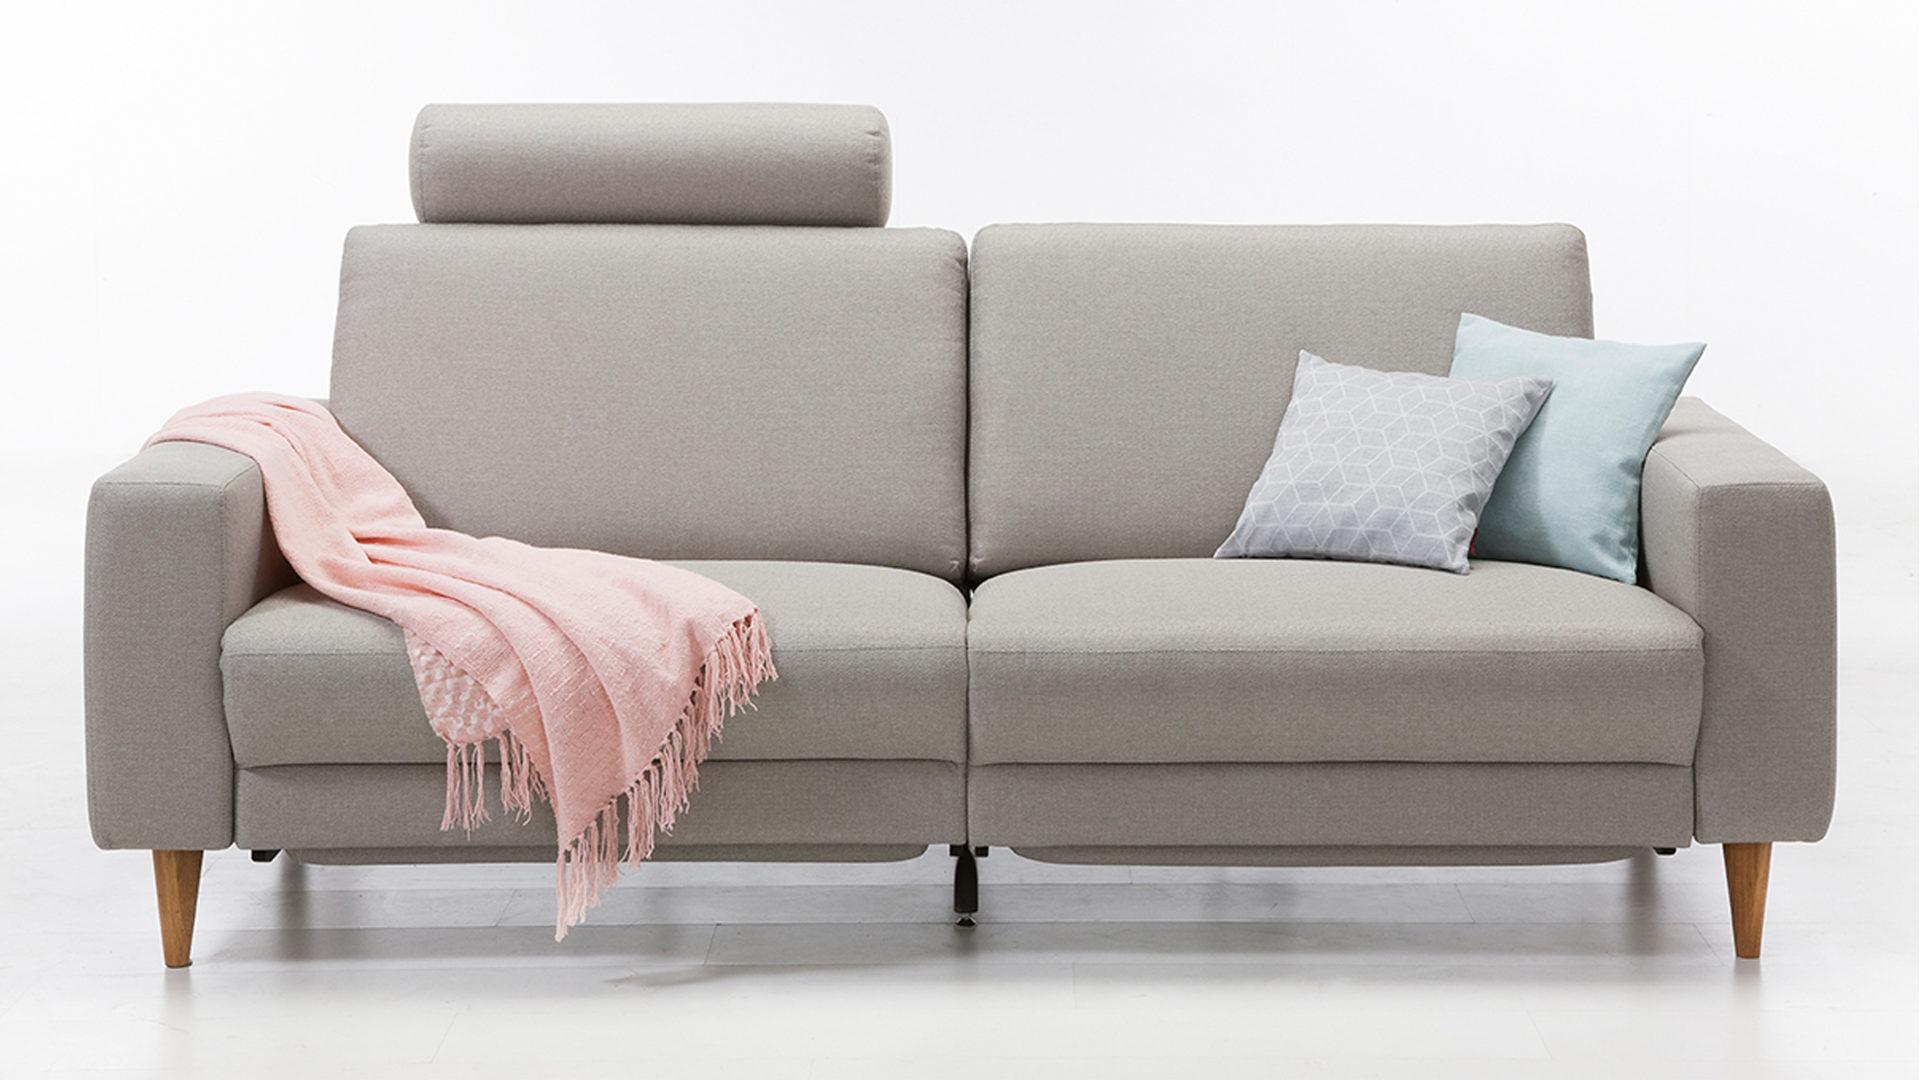 Mobel Eilers Apen Suchergebnis Fur Kamin Zweisitzer Sofa